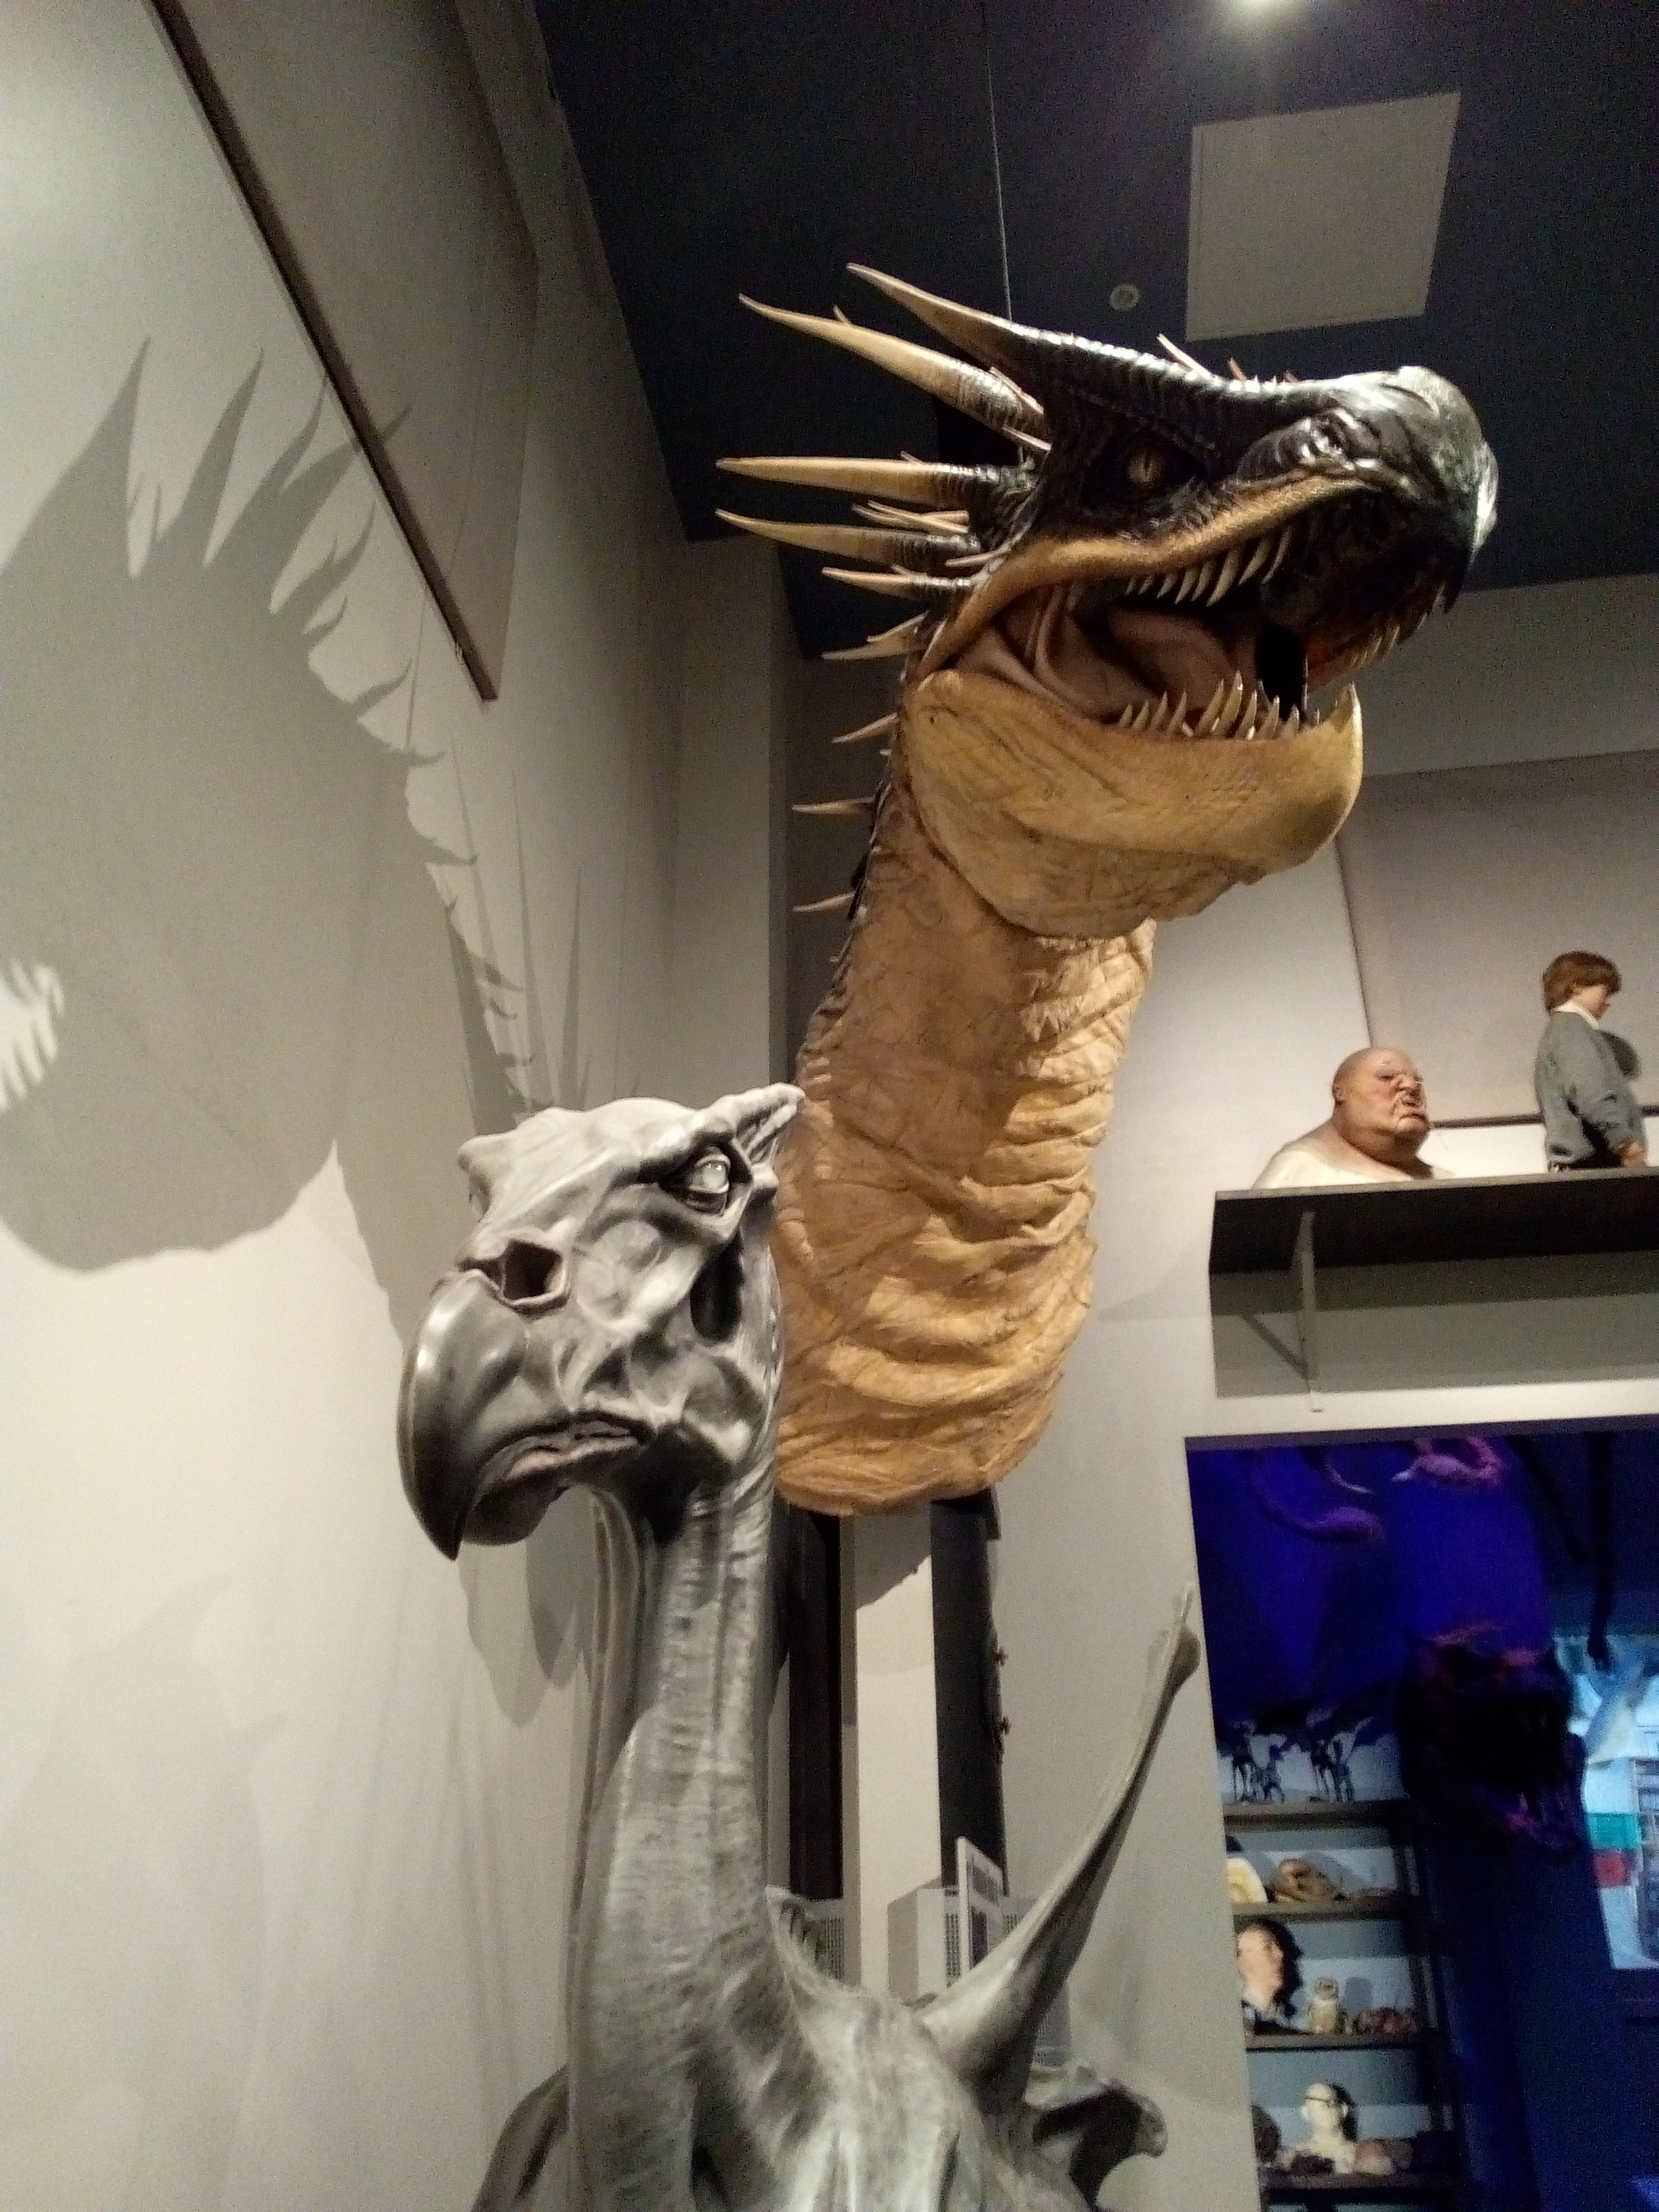 Dragon de Gringotts - The Making of Harry Potter - Studio Tour London